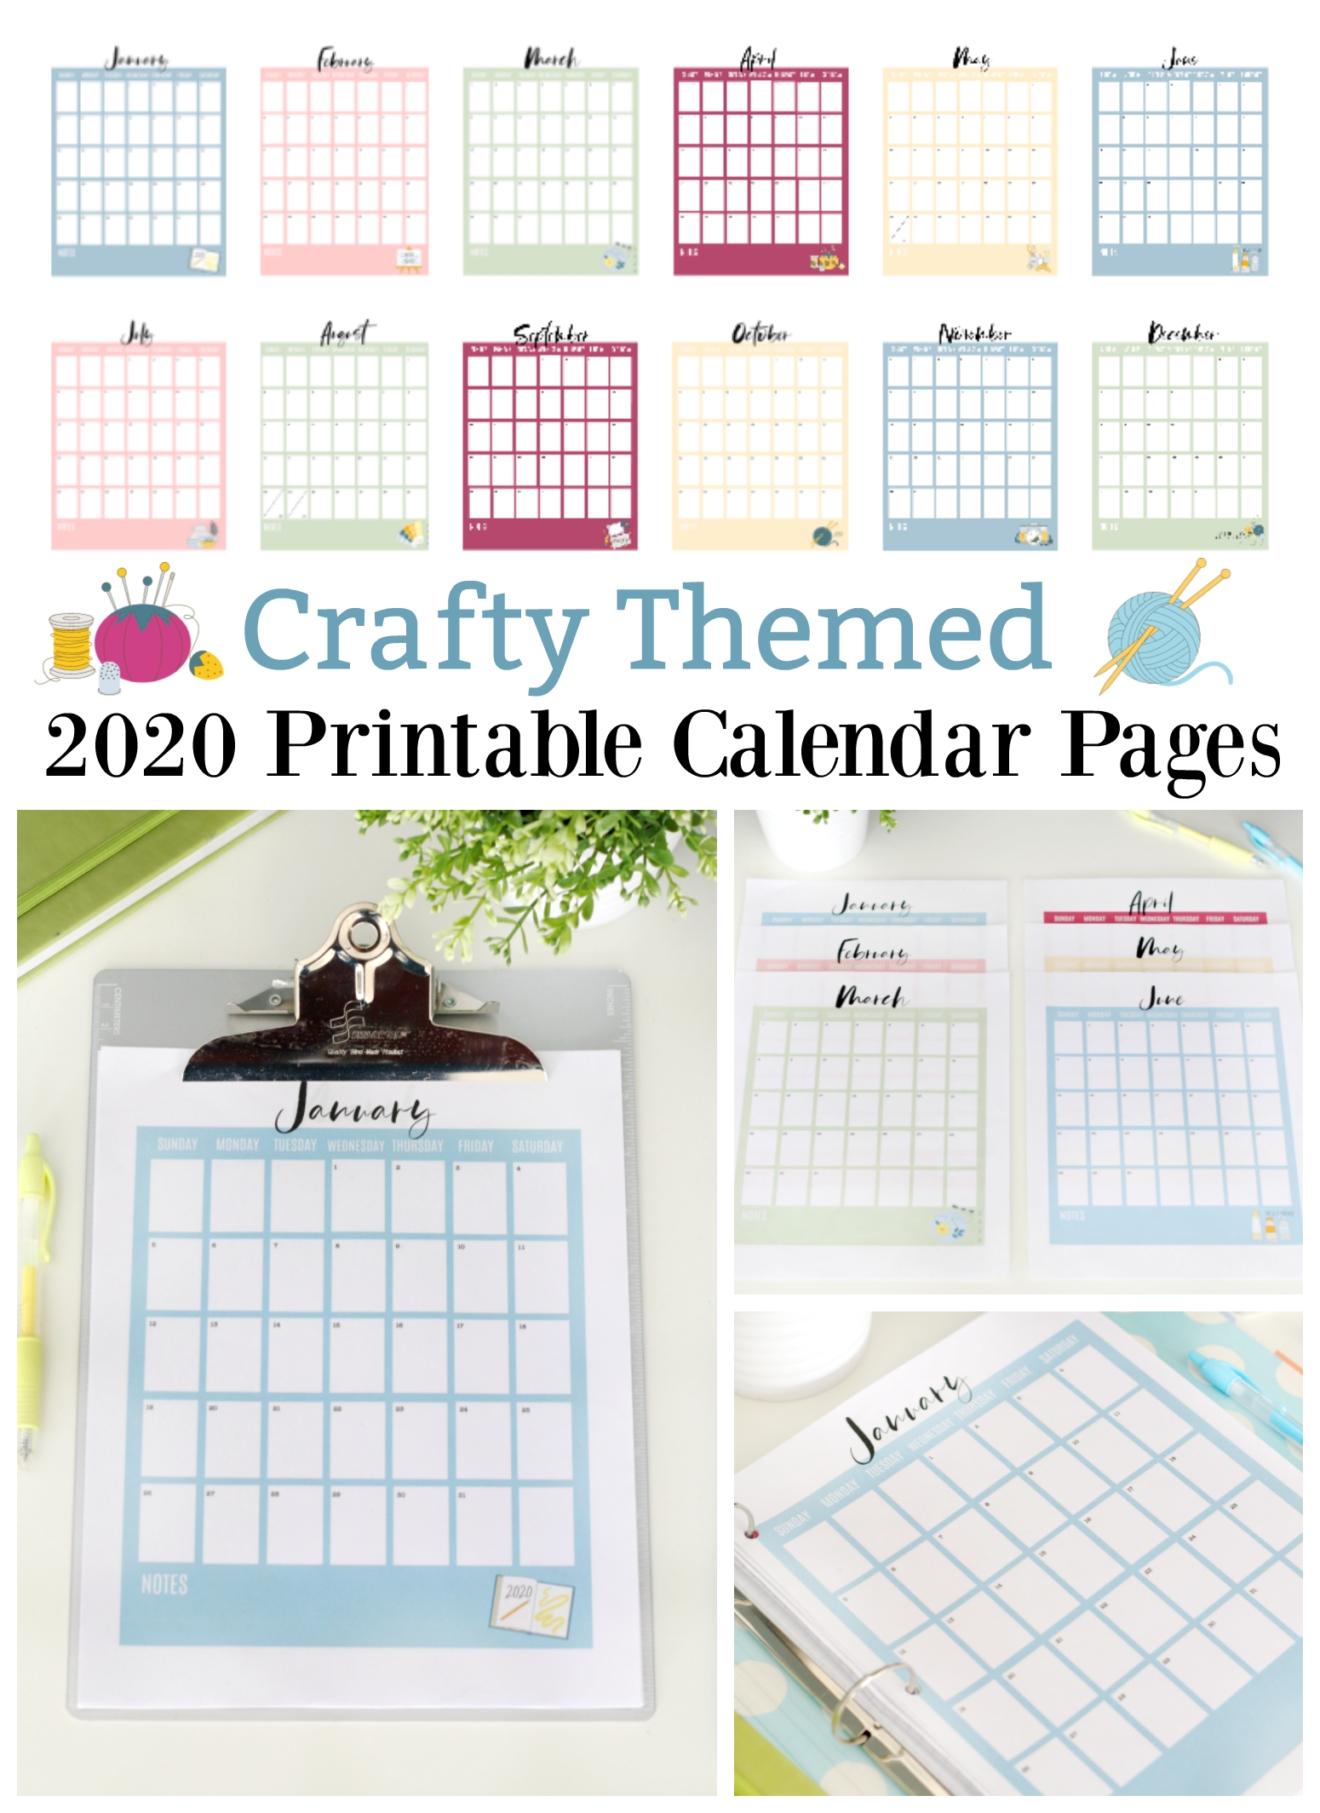 2020 Printable Calendar Pages (free!)   Printable Calendar